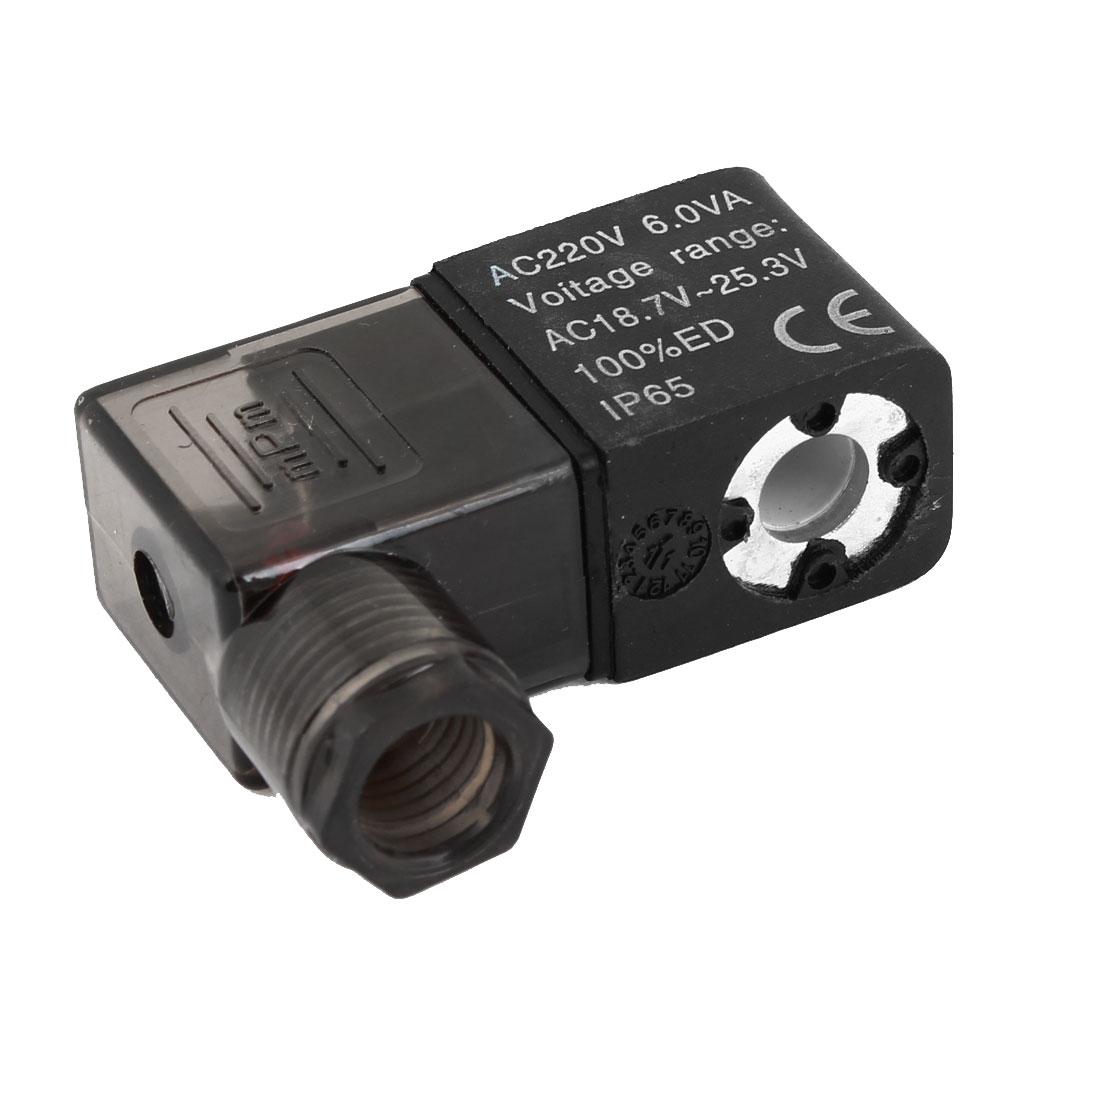 AC220V 6.0VA Electrical Part Pneumatic Air Solenoid Valve Coil